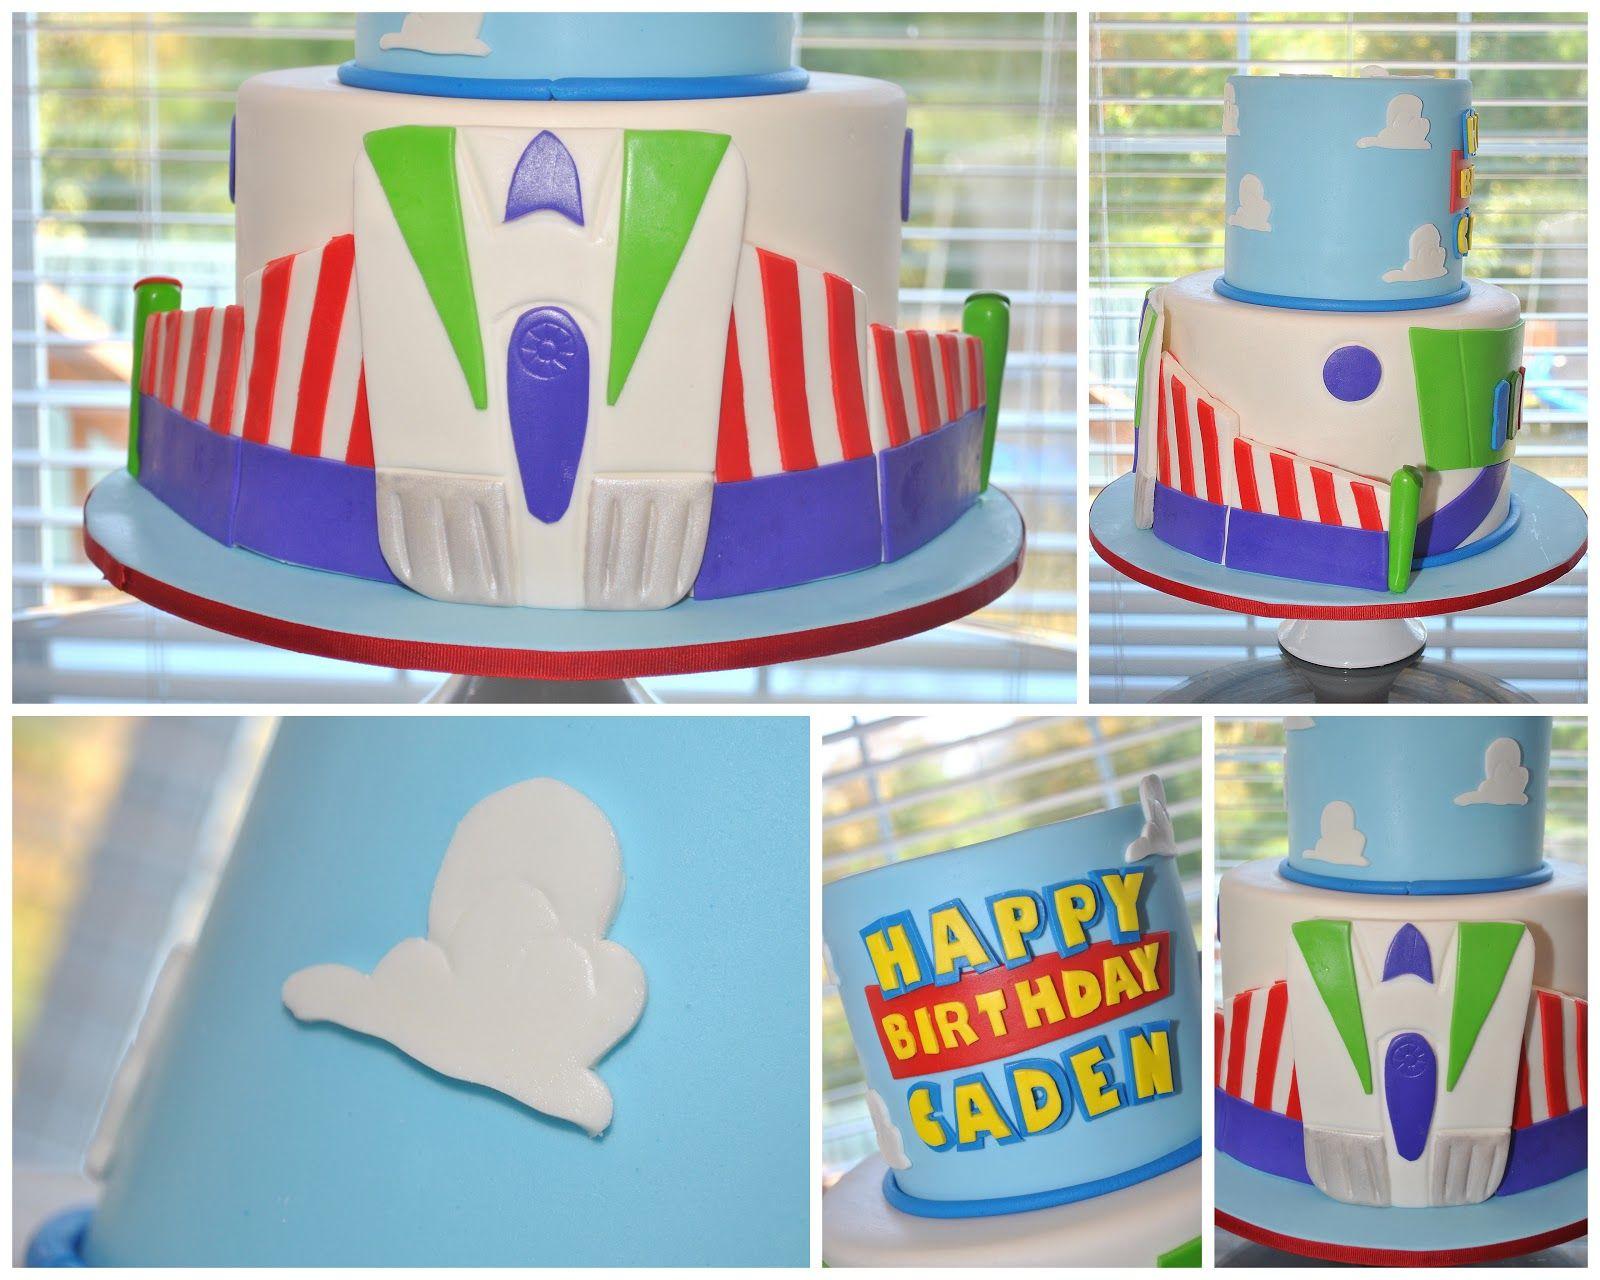 Hopes sweet cakes buzz lightyear cake hopes sweet cakes hopes sweet cakes buzz lightyear cake pronofoot35fo Gallery